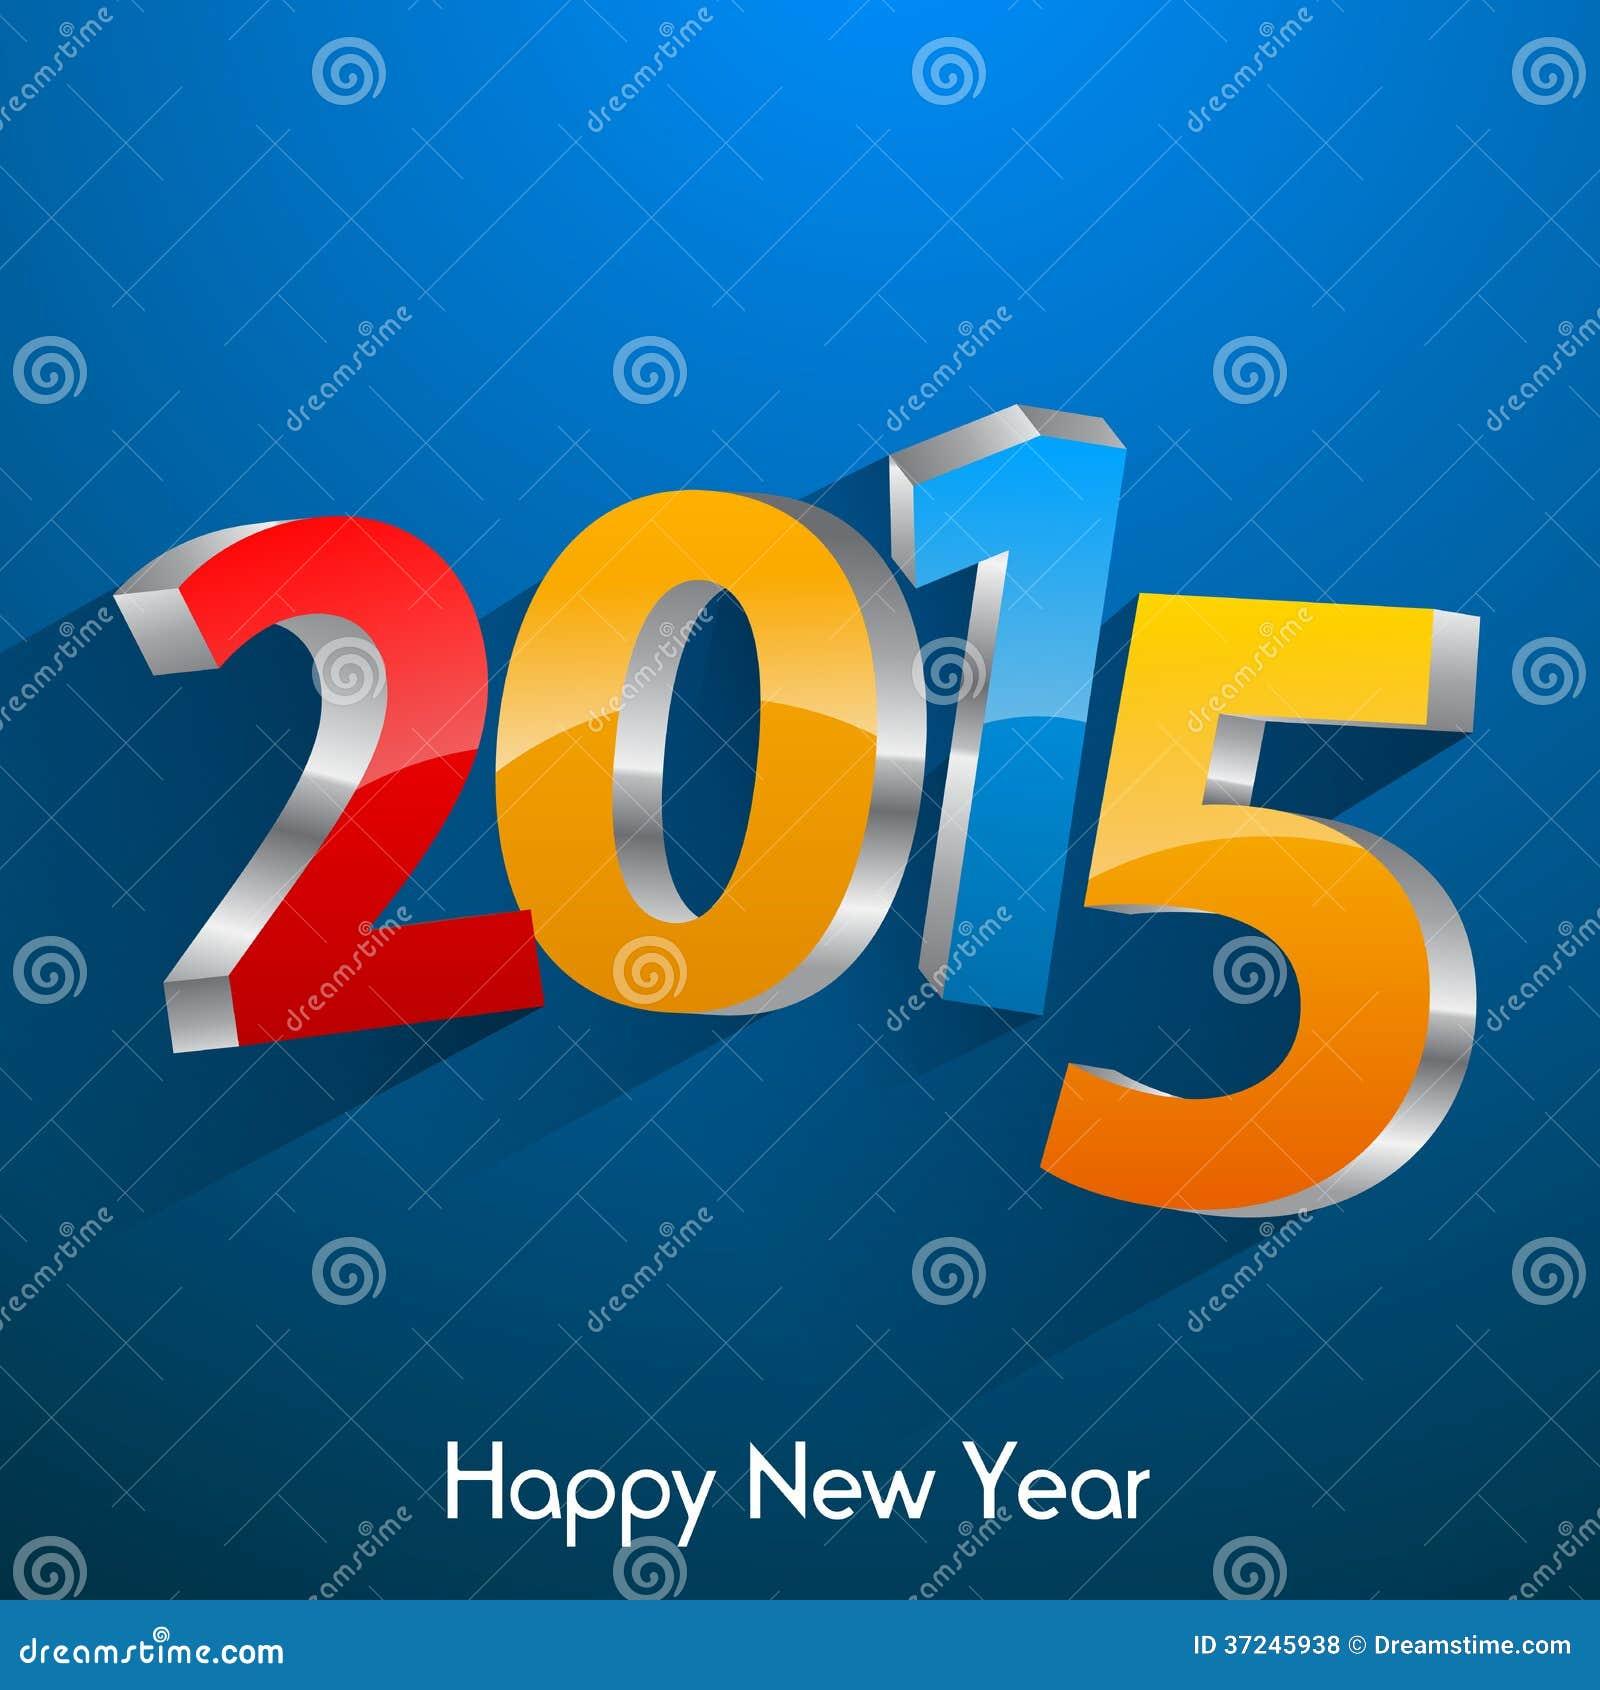 Happy New Year 2015 Royalty Free Stock Photos